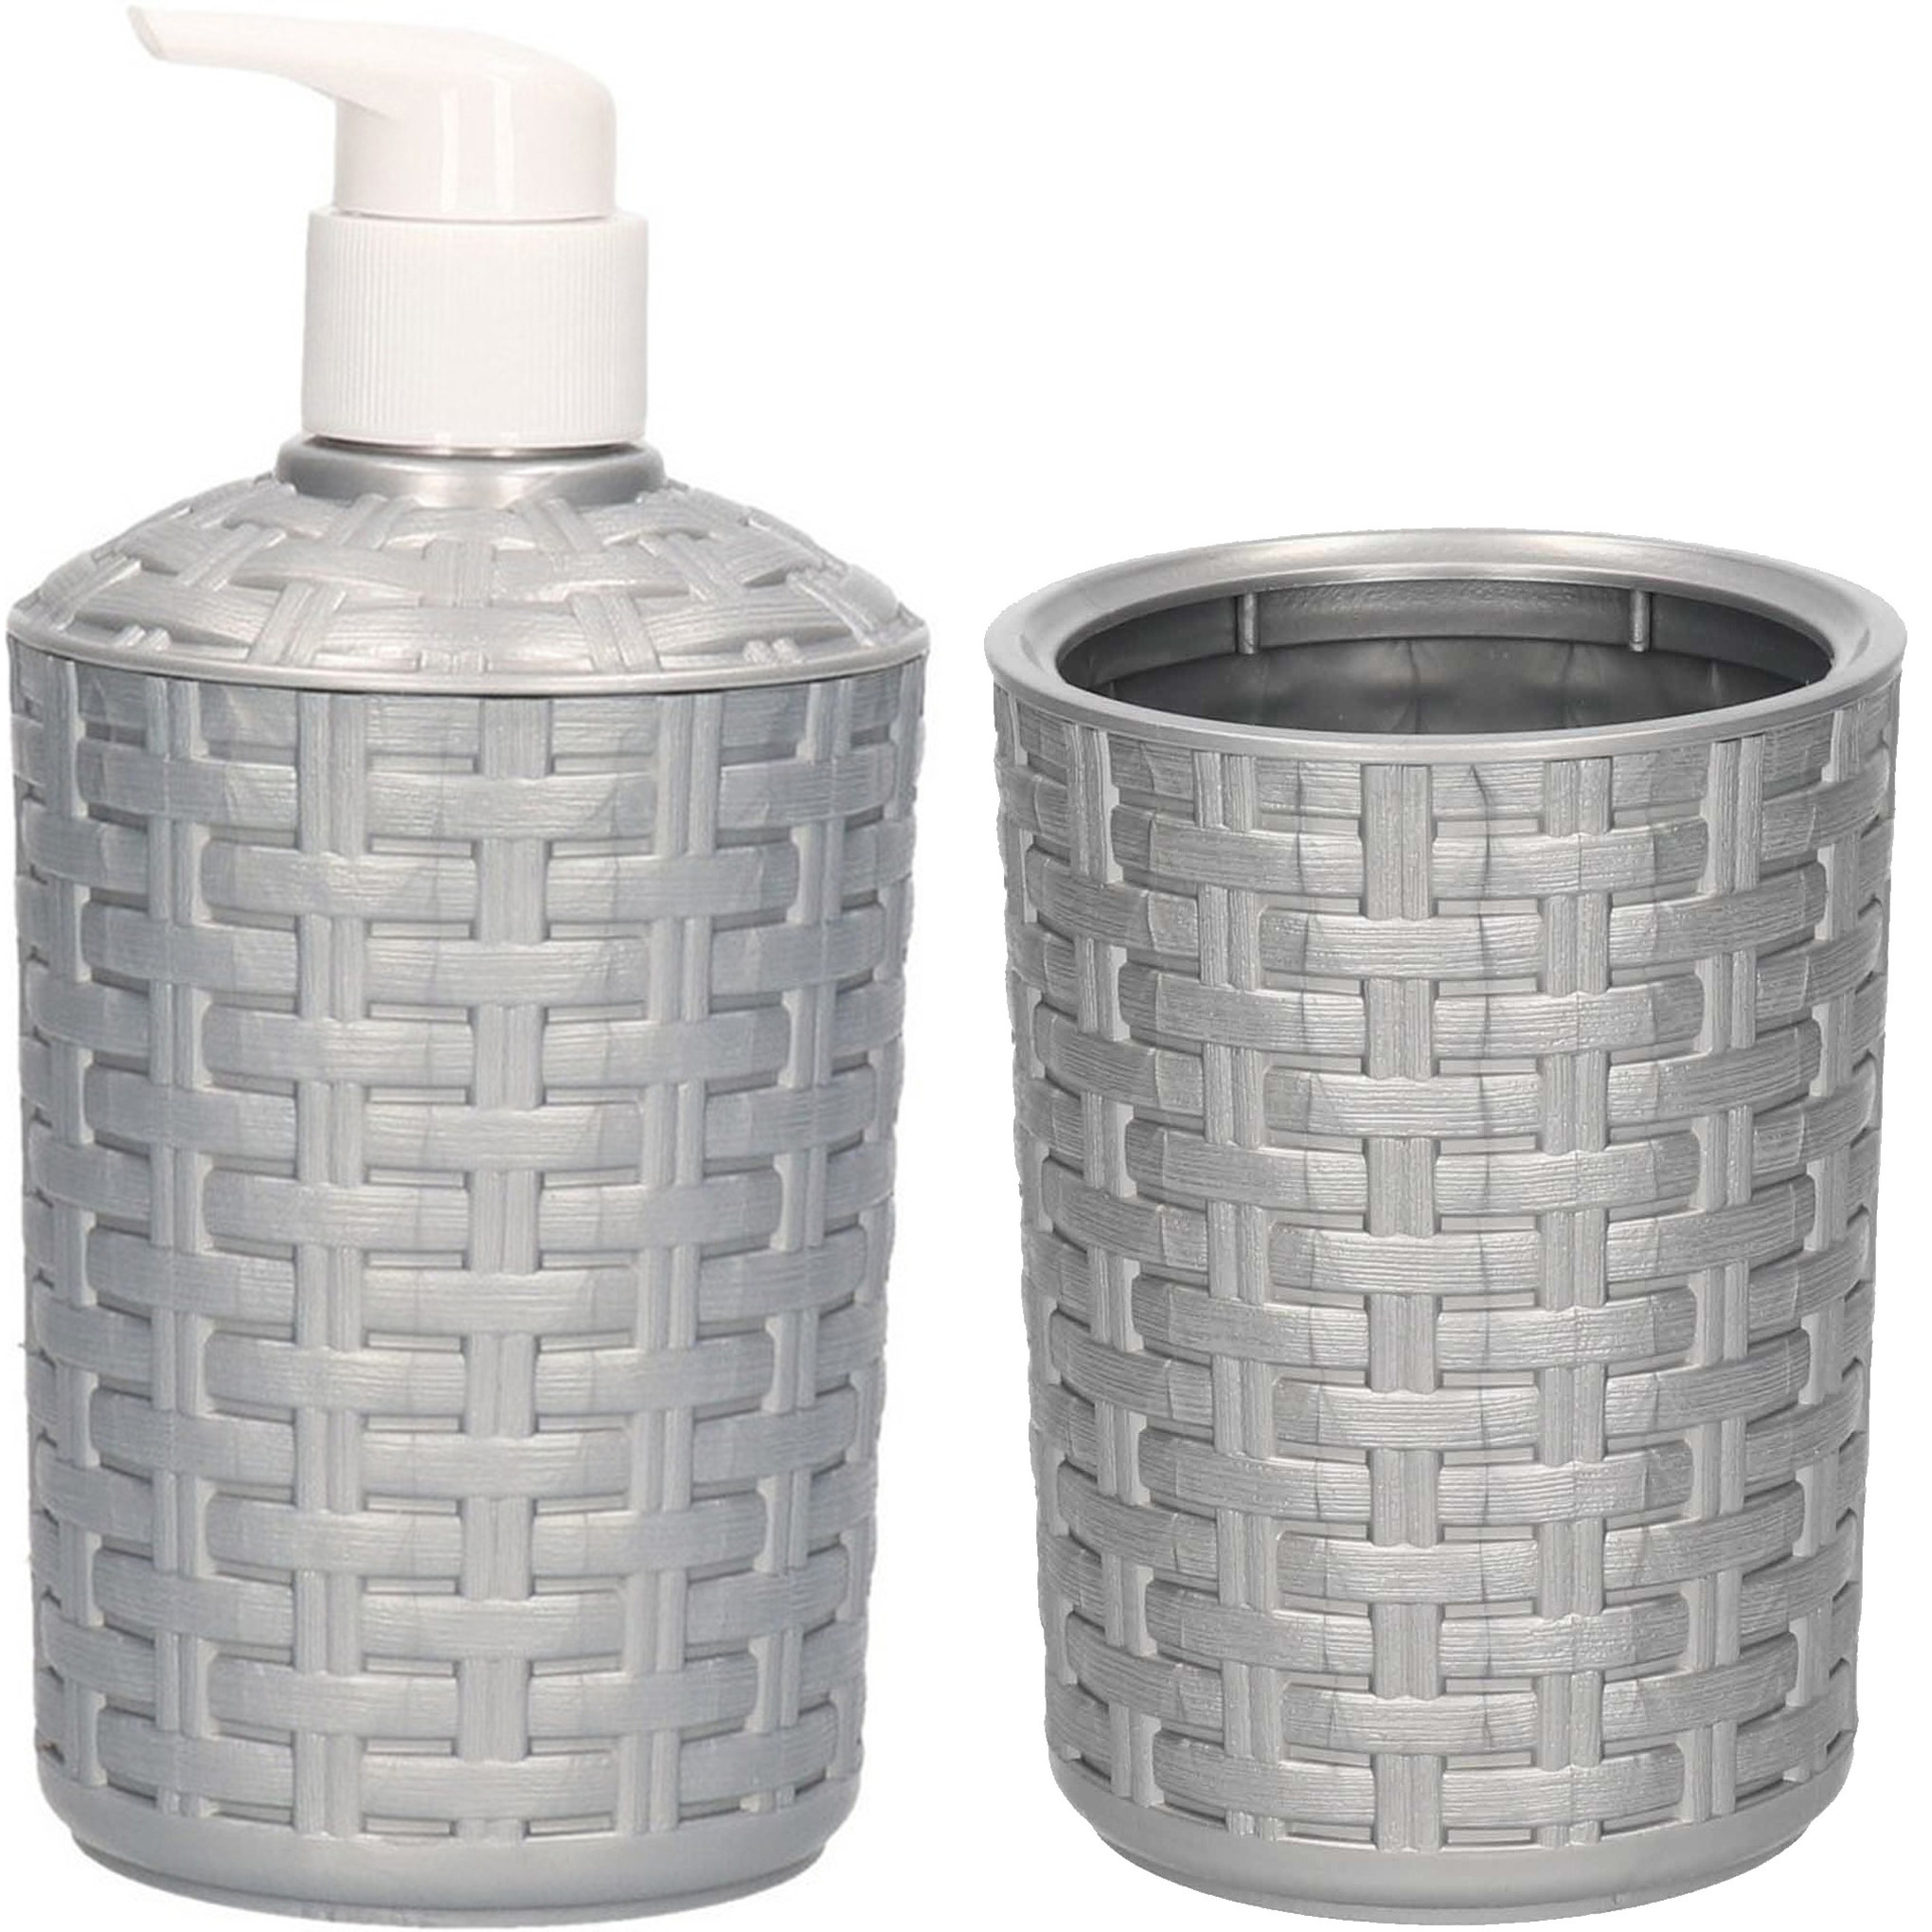 Zeep pompje-dispenser en tandenborstel-tandpasta houder set zilver